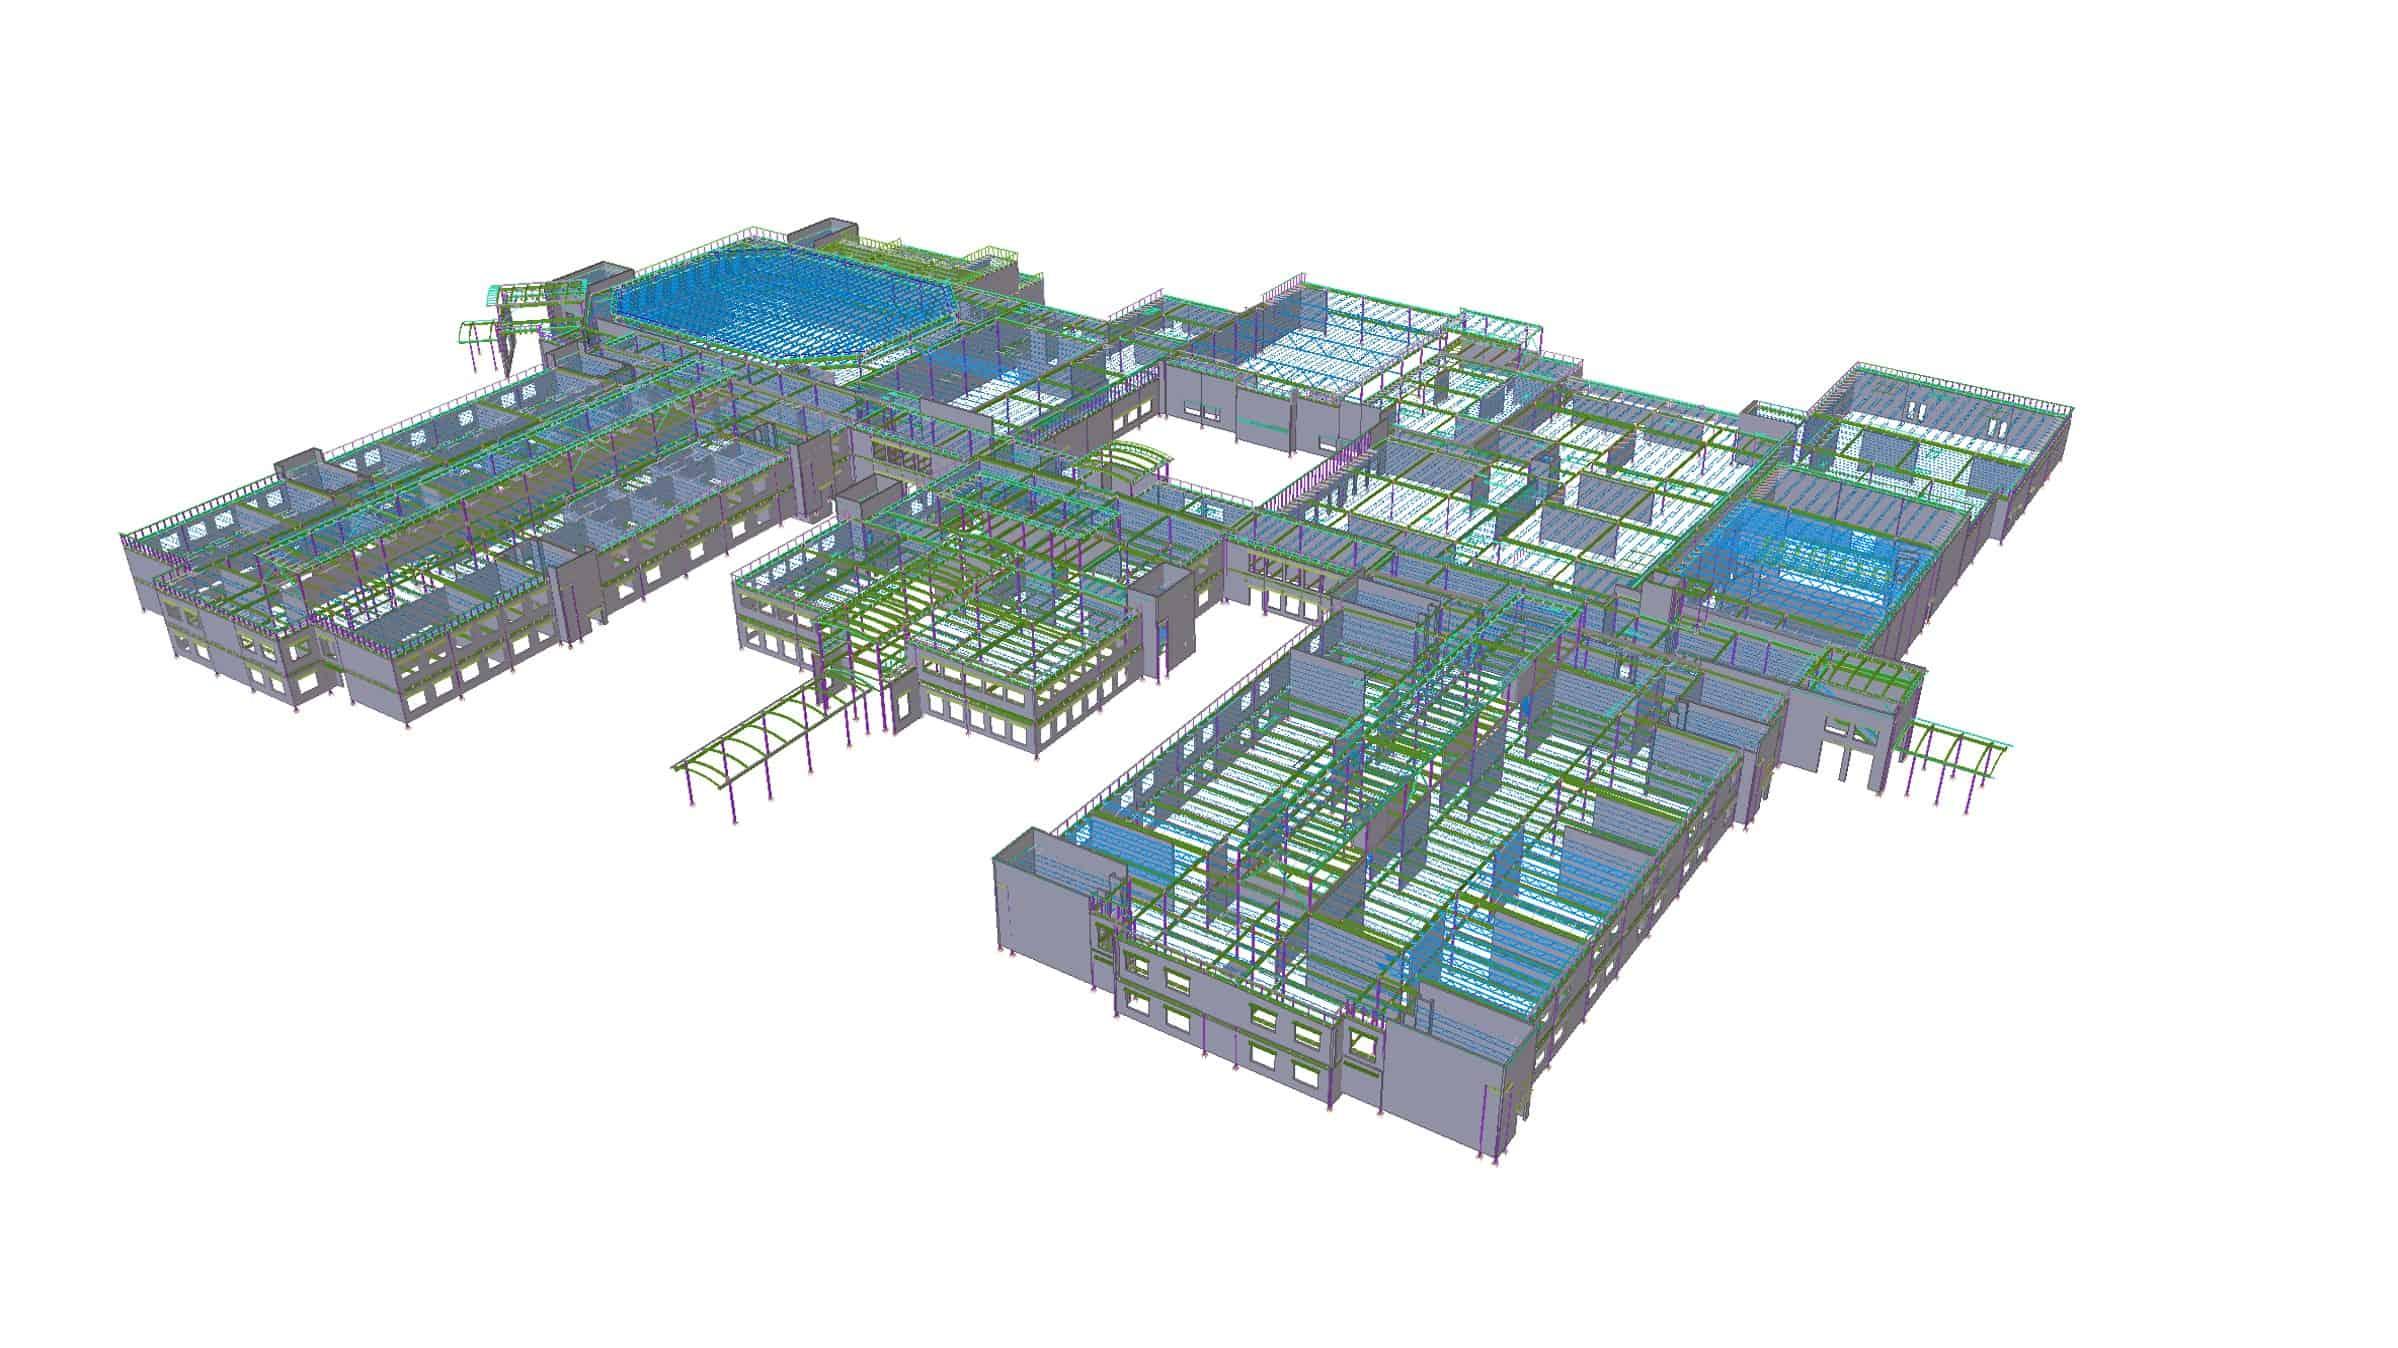 denmark - Steel concrete & rebar detailing, Tekla structural design & consulting. JMT Consultants